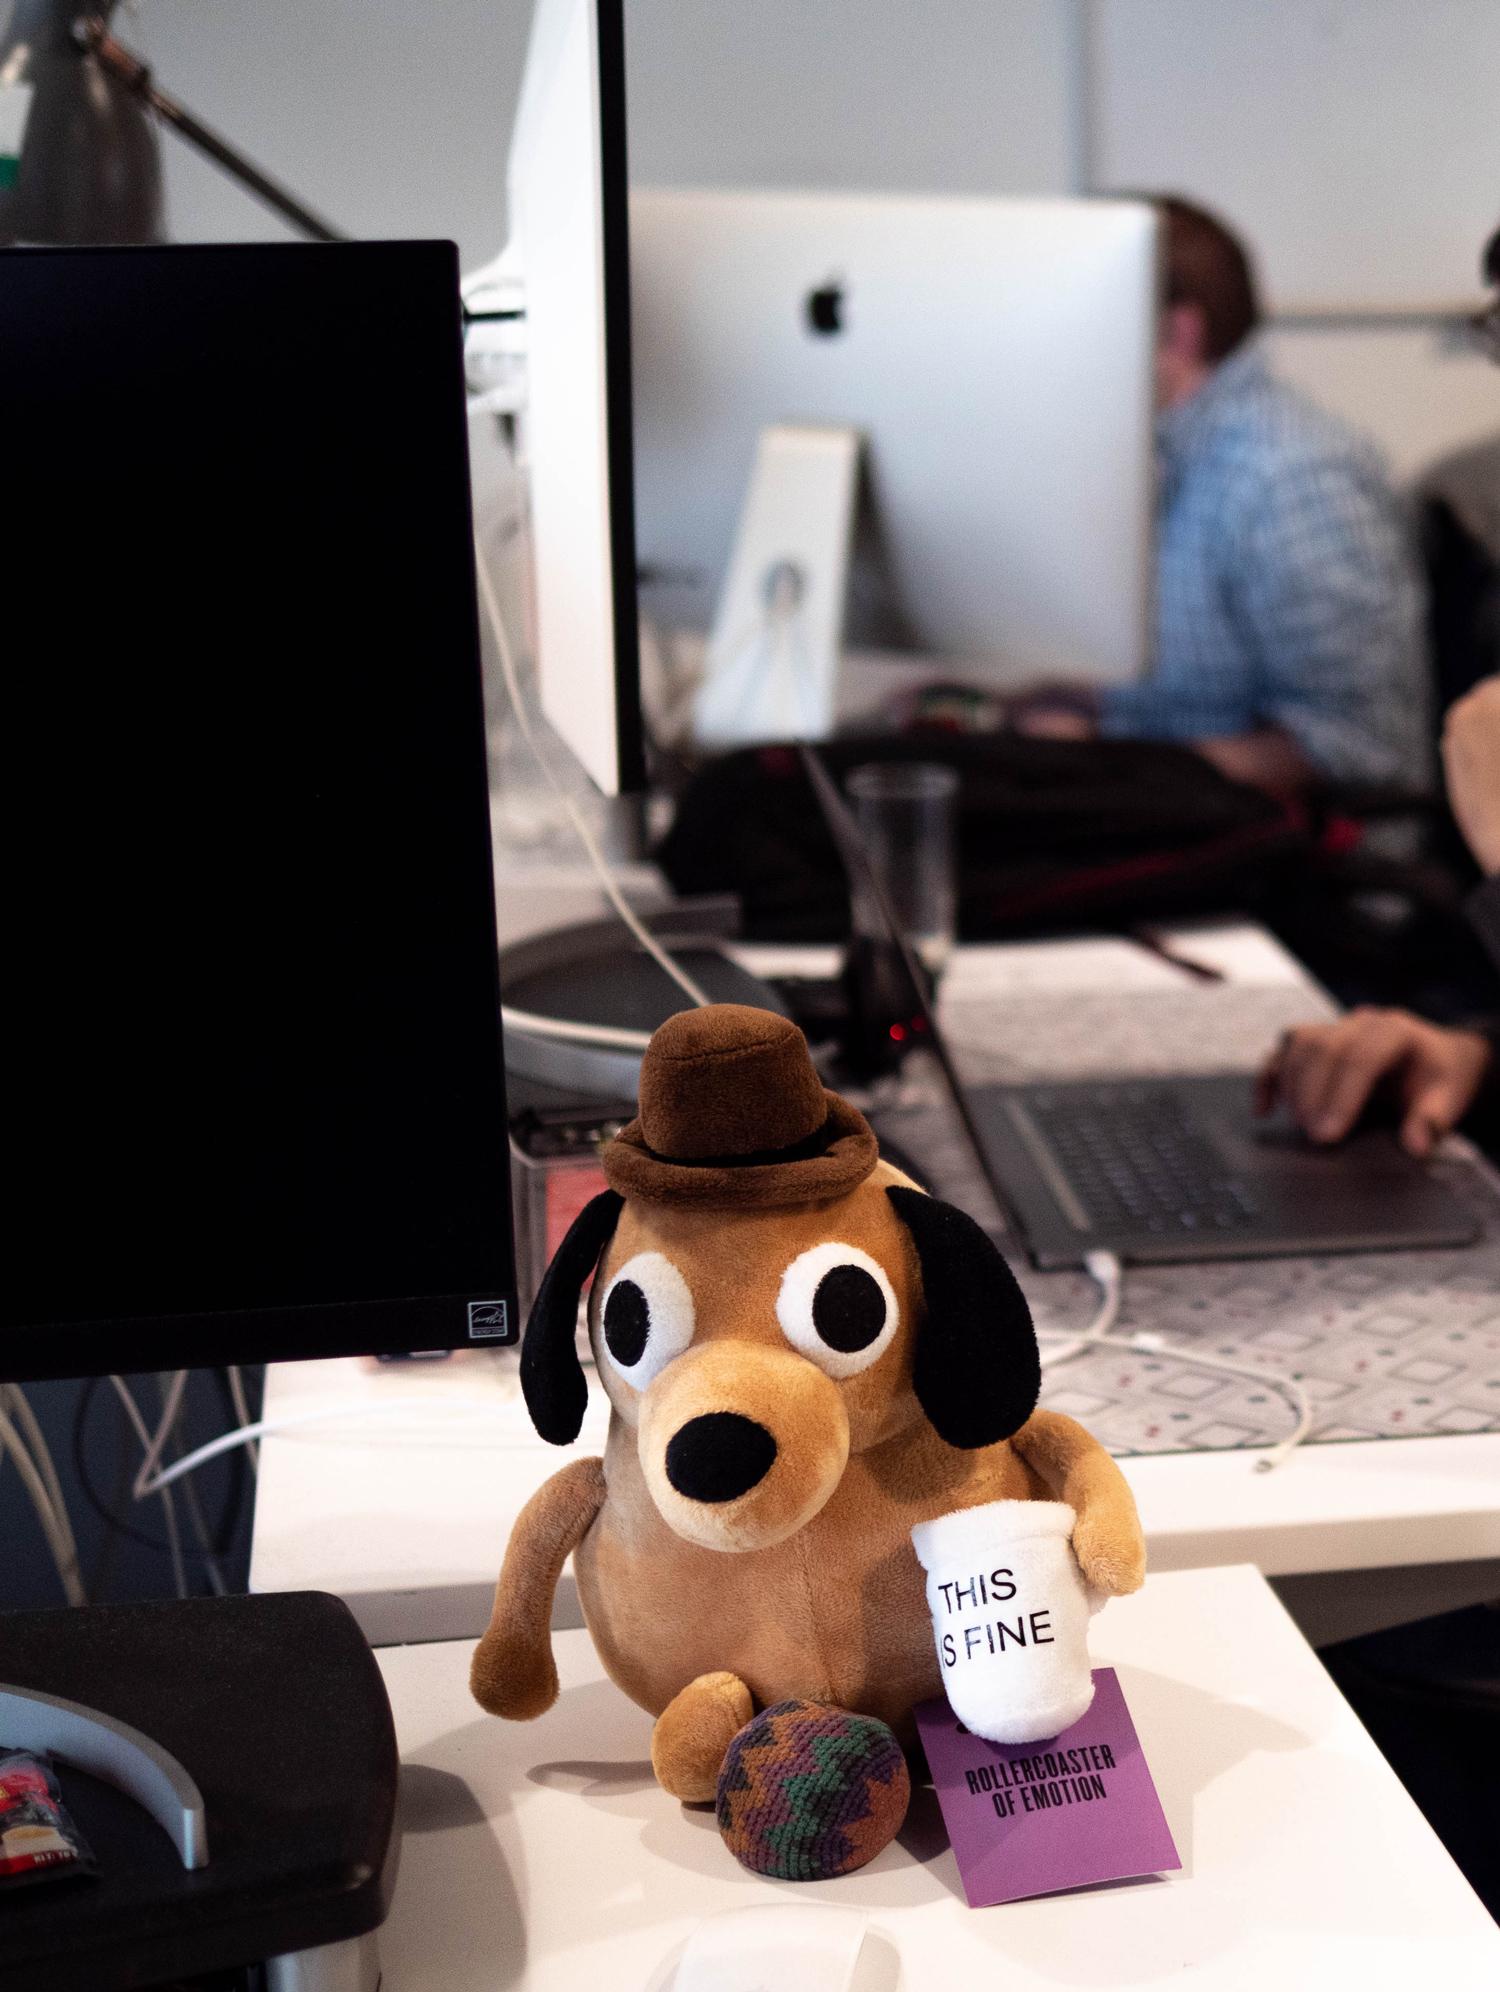 A stuffed animal on a desk